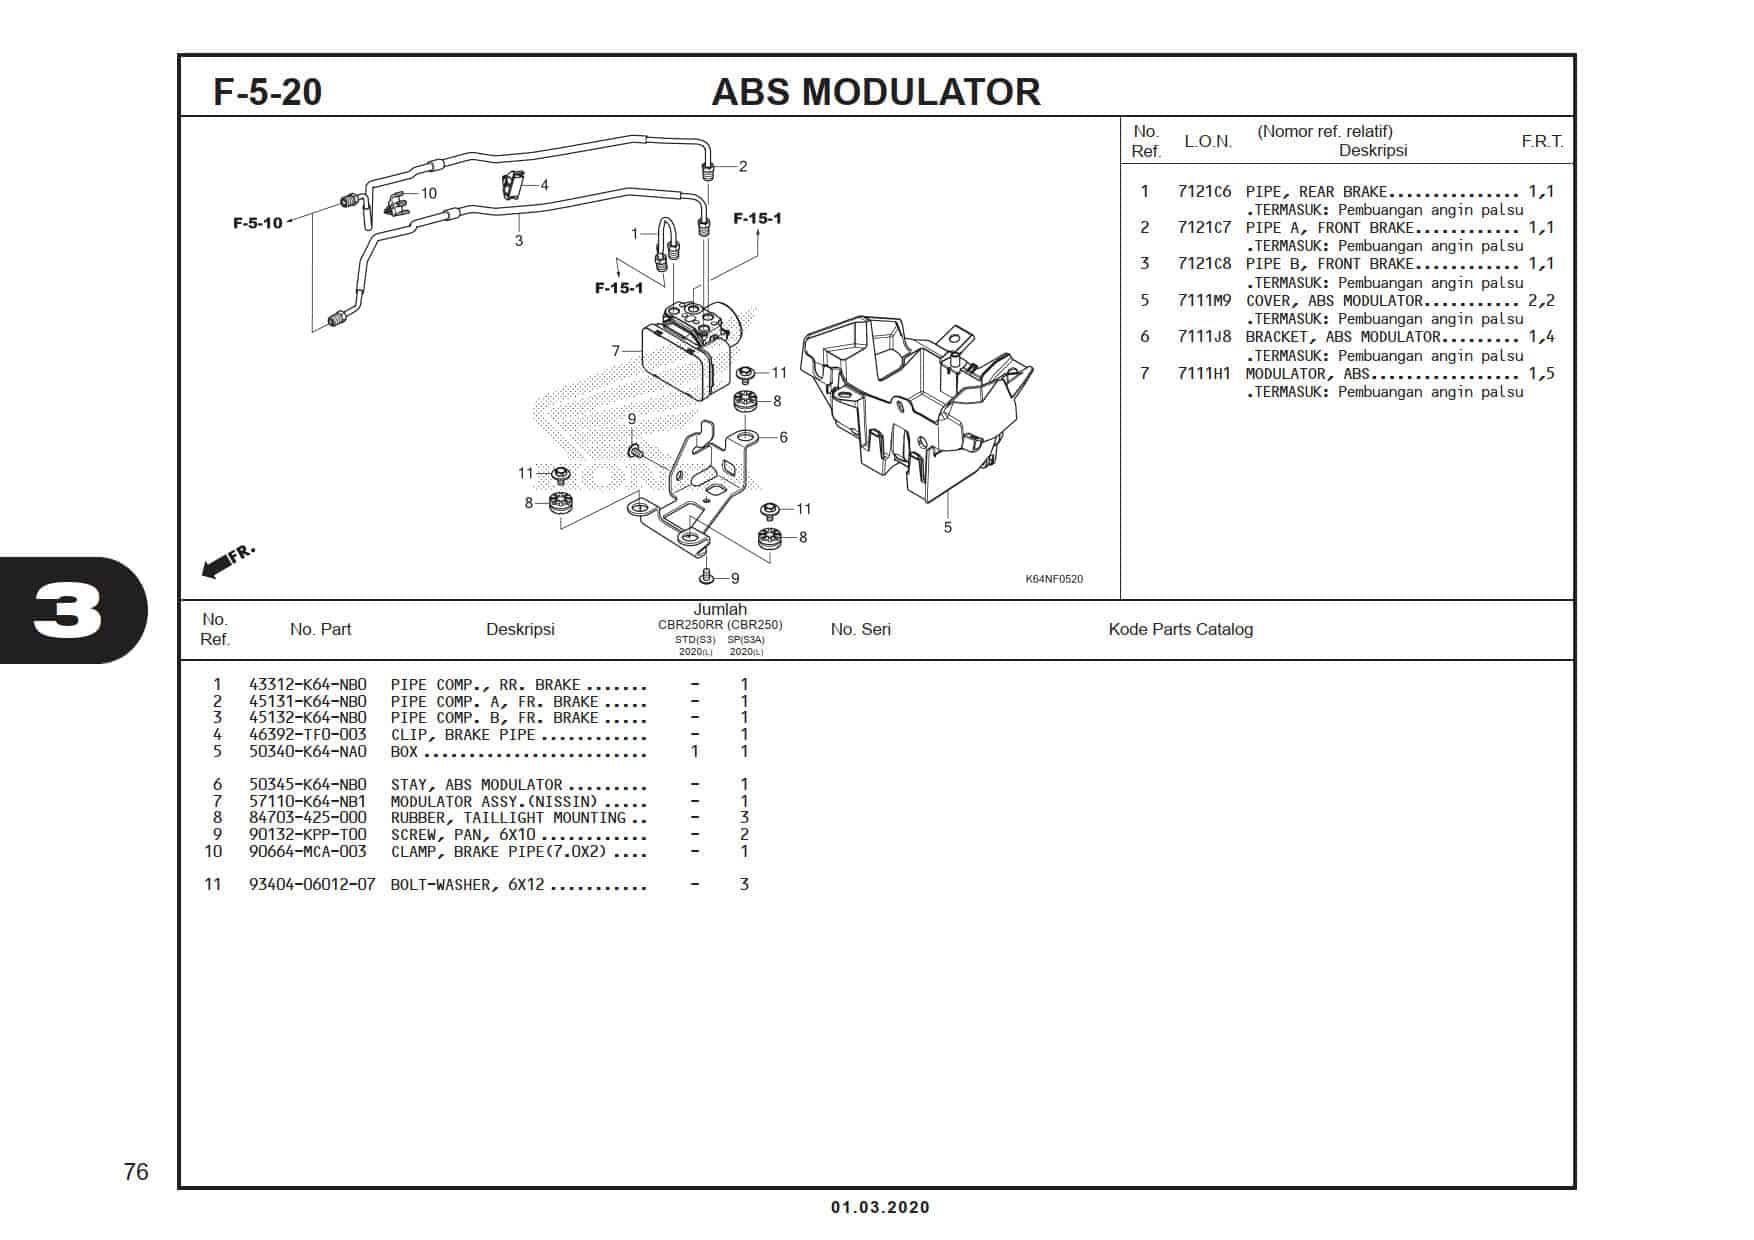 F-5-20 ABS Modulator